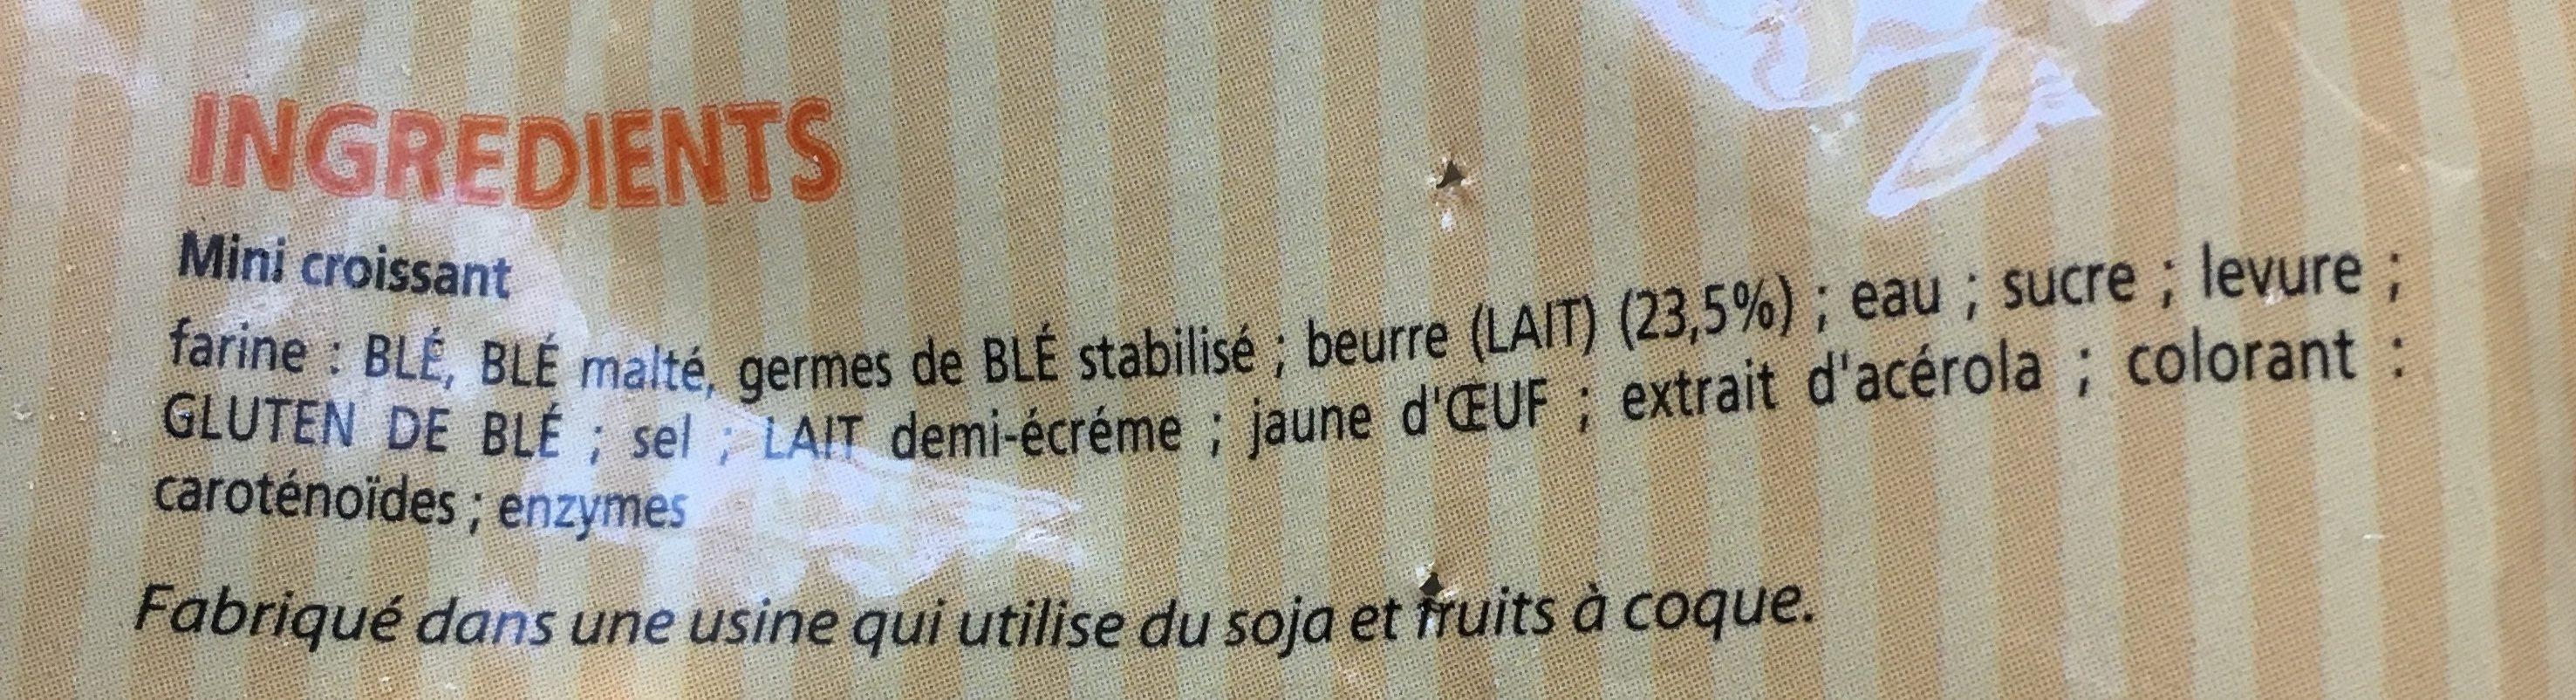 Mini croissants - Ingredients - fr